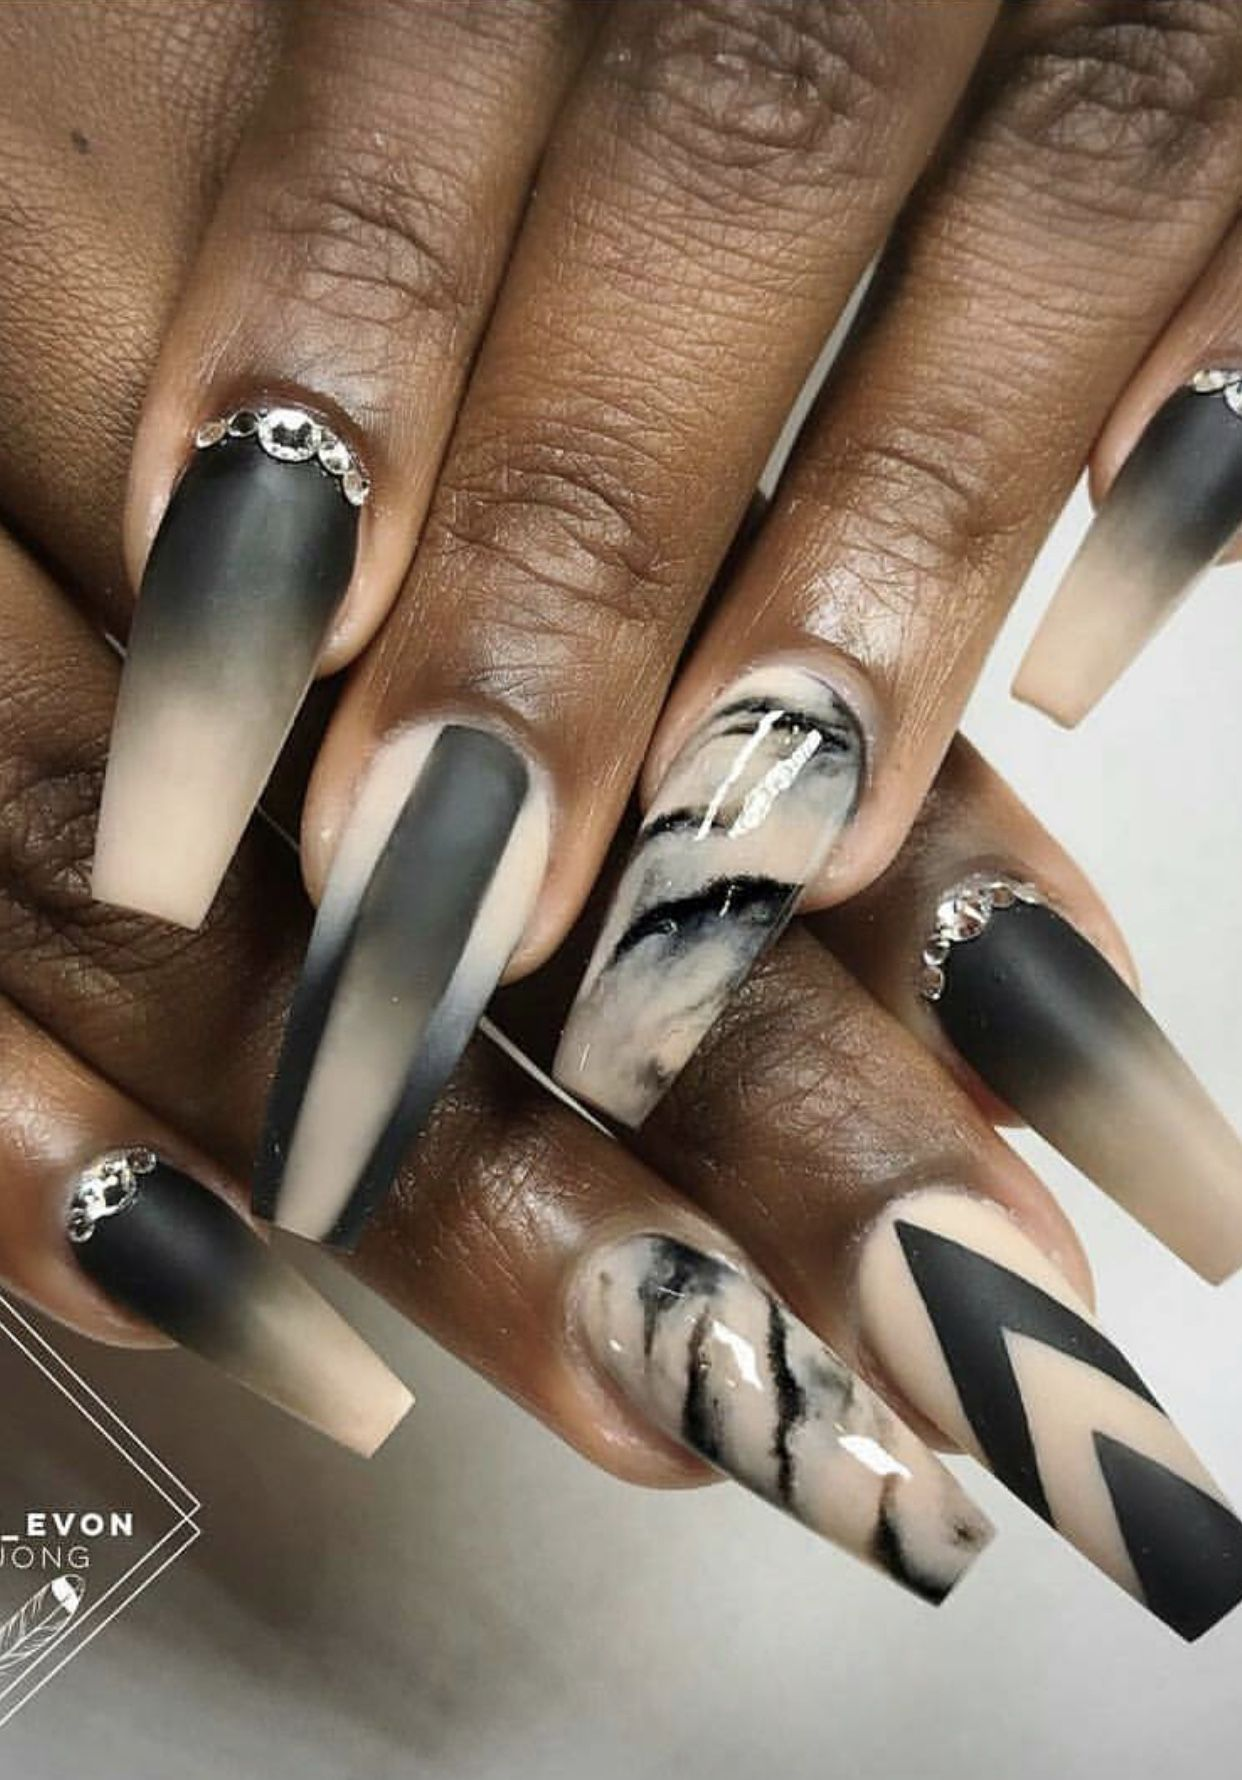 Pin van Esther van Strien op nail art   Pinterest